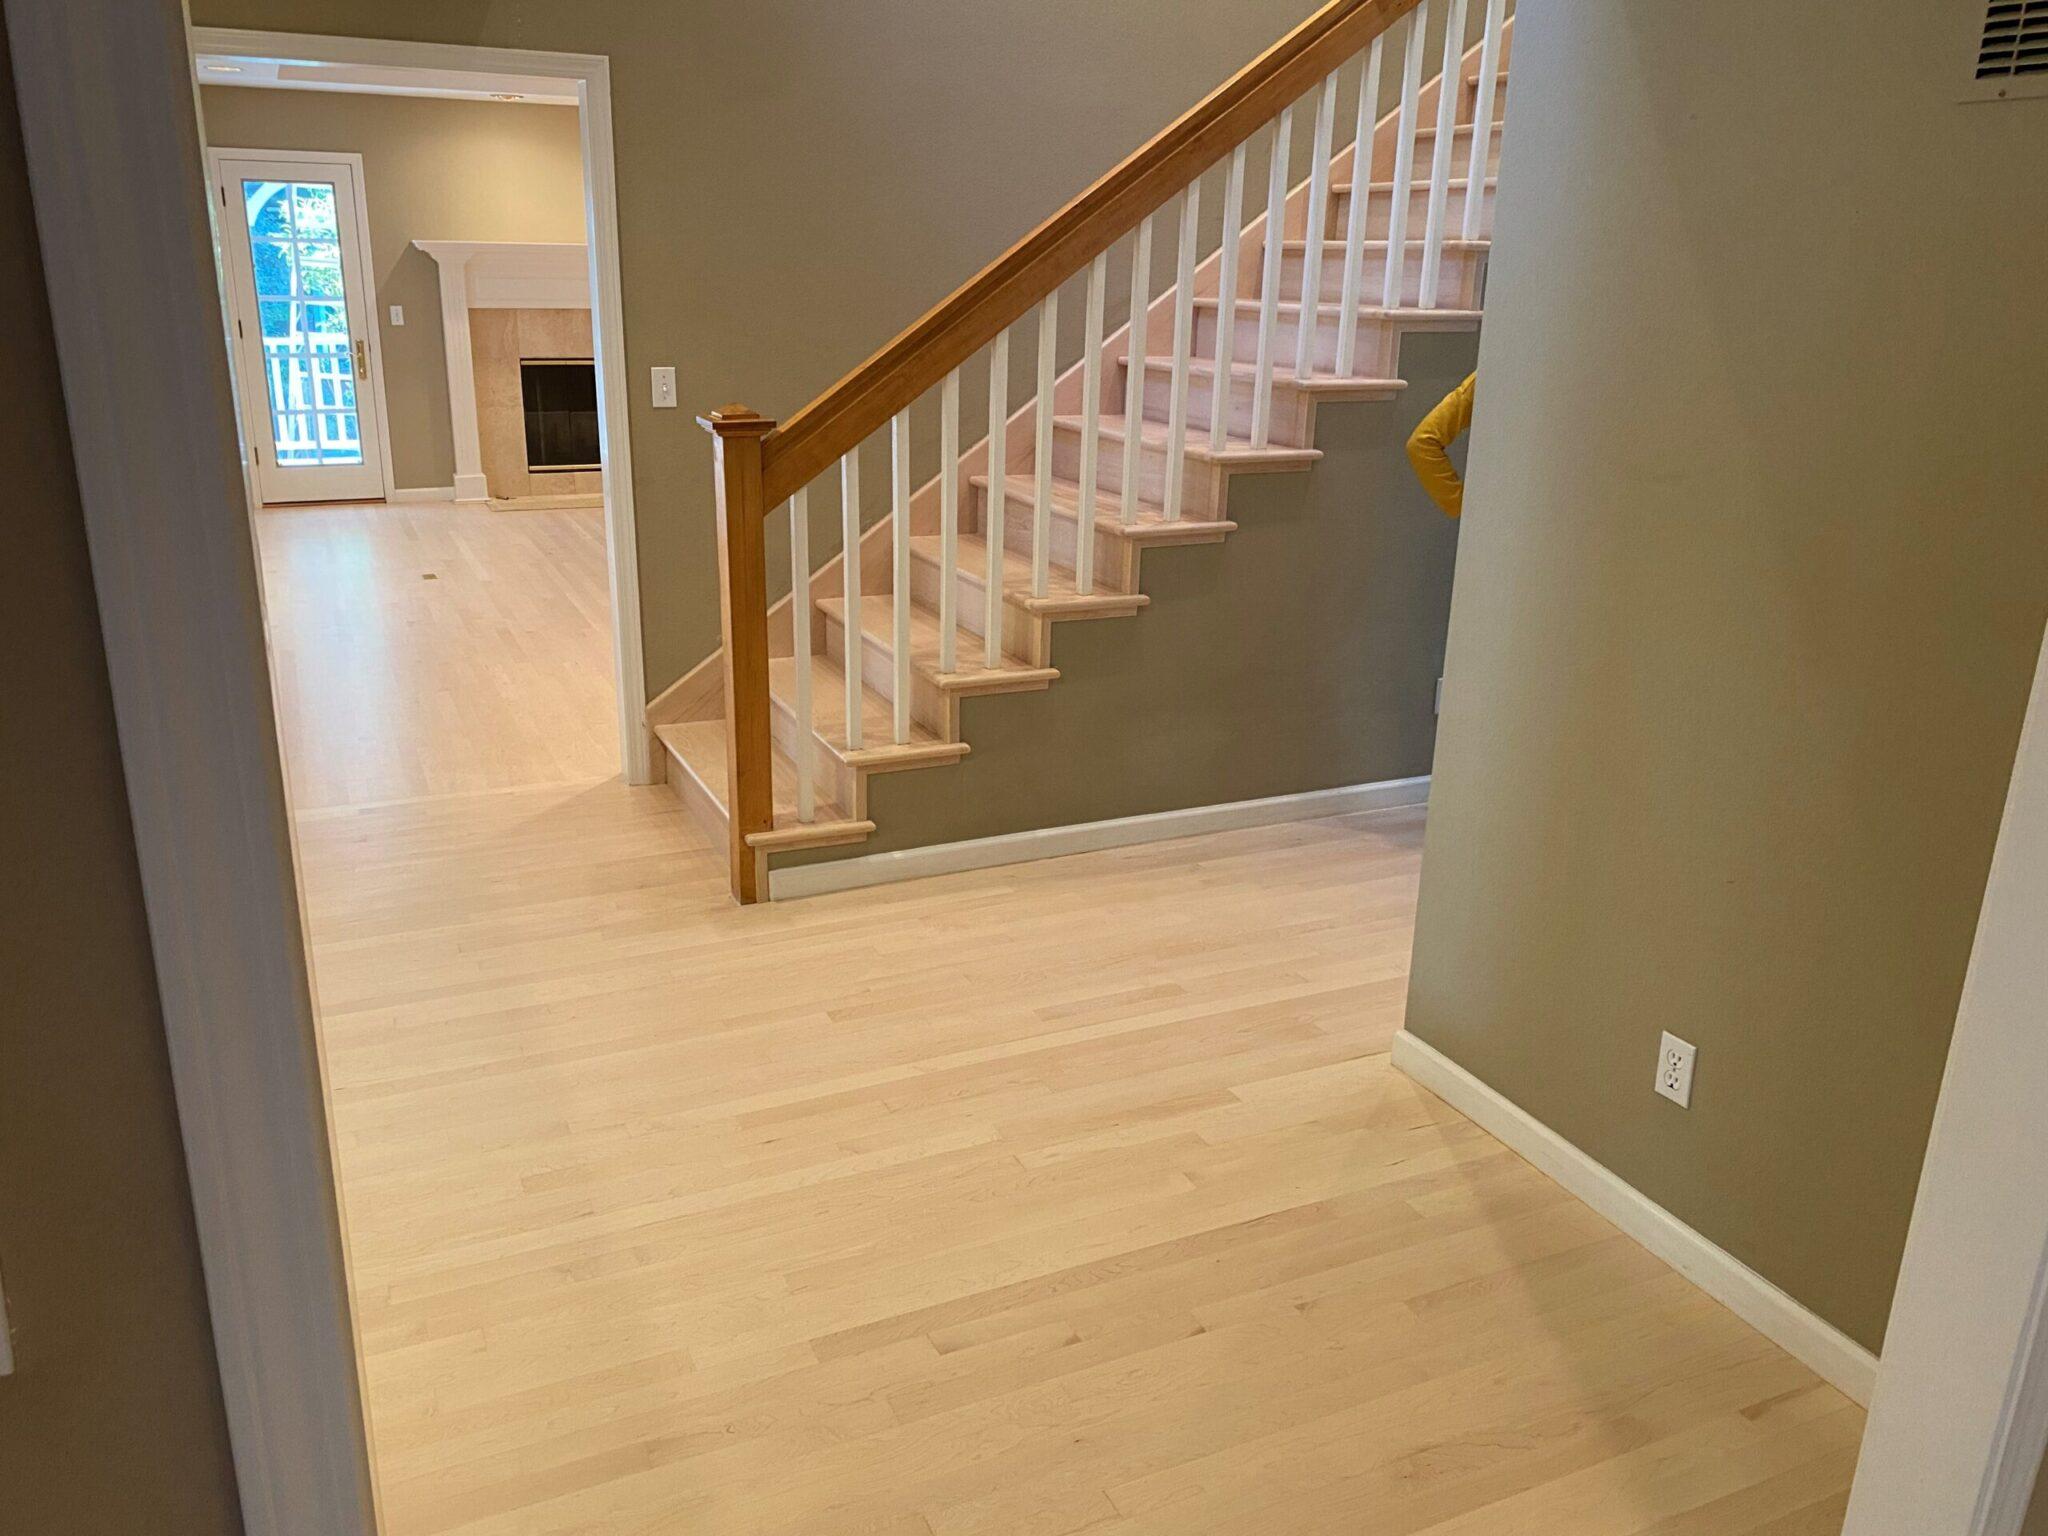 Staircase in Santa Cruz Home After Hardwood Floor Restoration